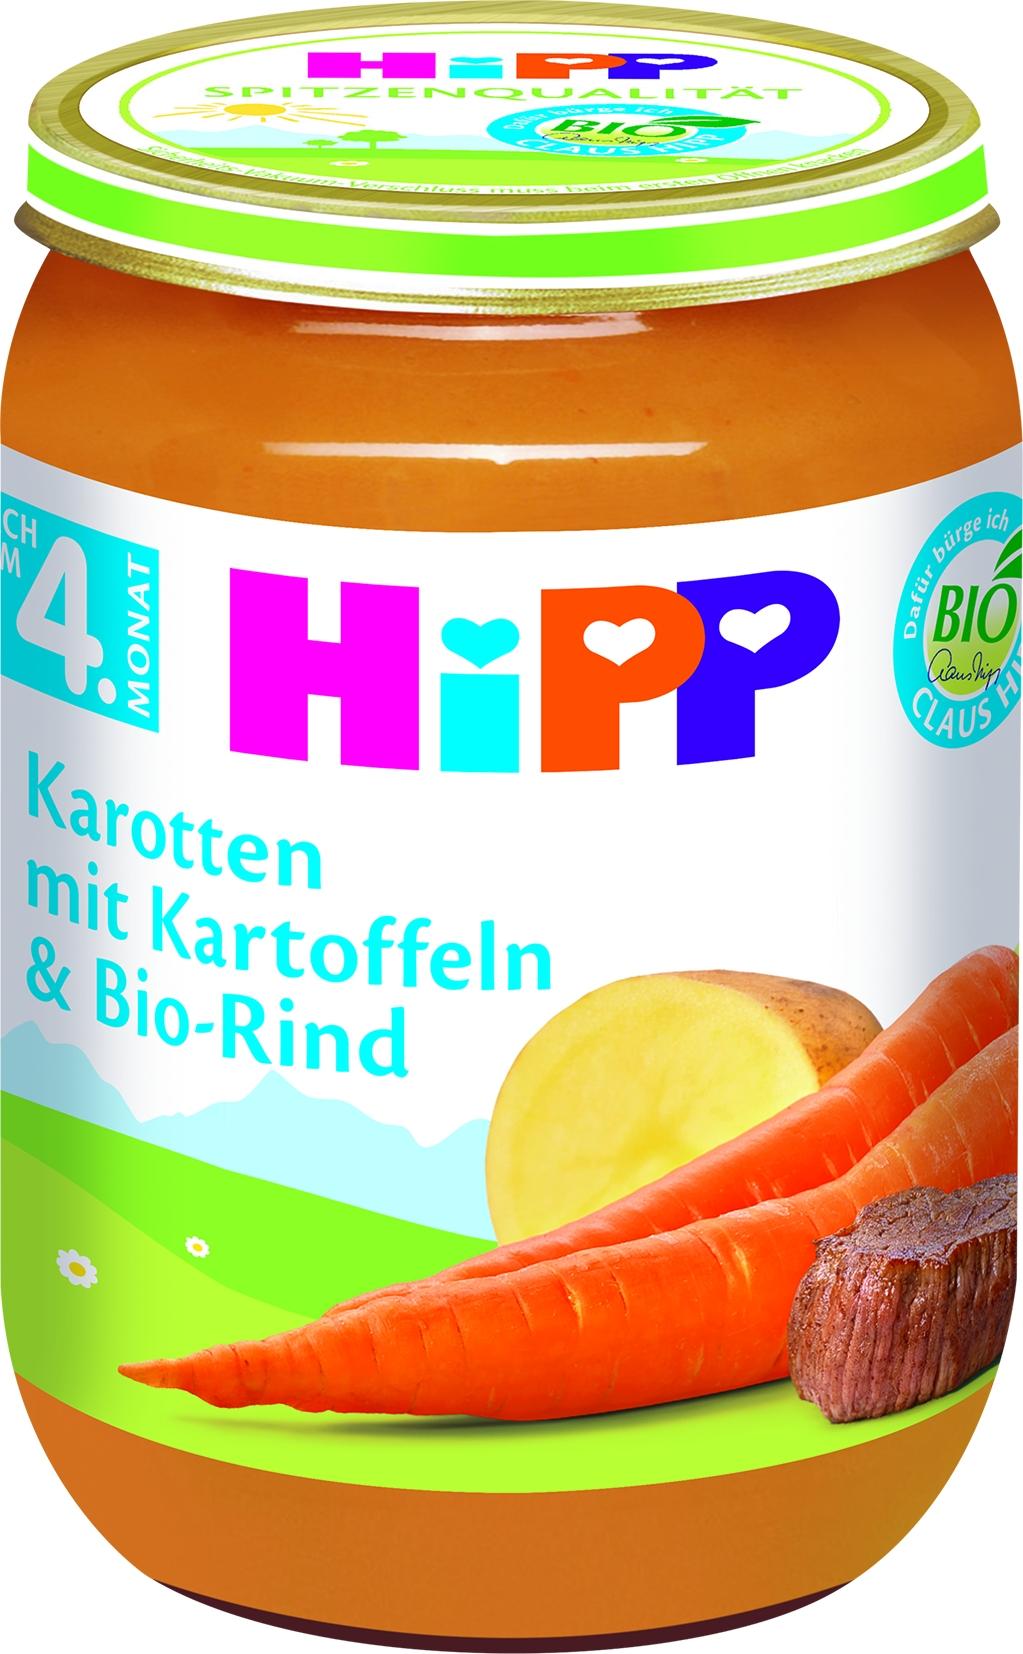 Bio 6240 Karotten/Kartoffeln/Rind